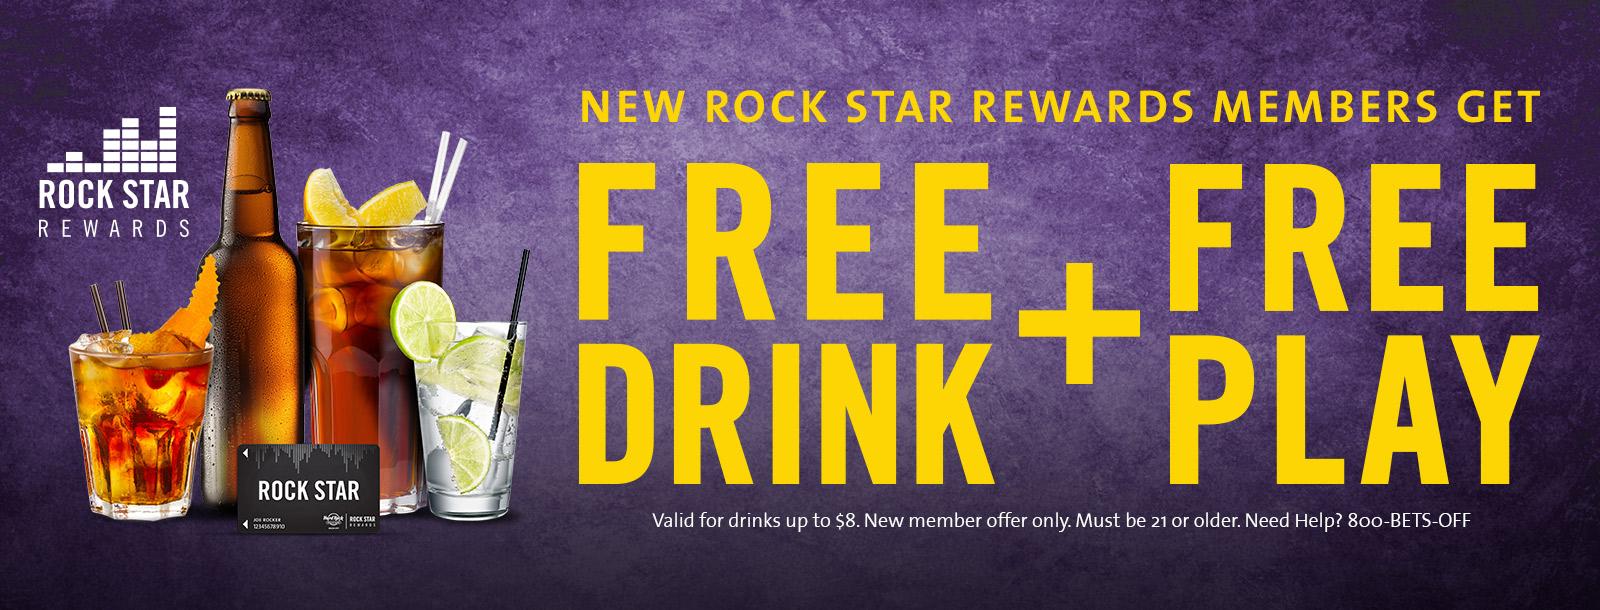 rock star rewards new members